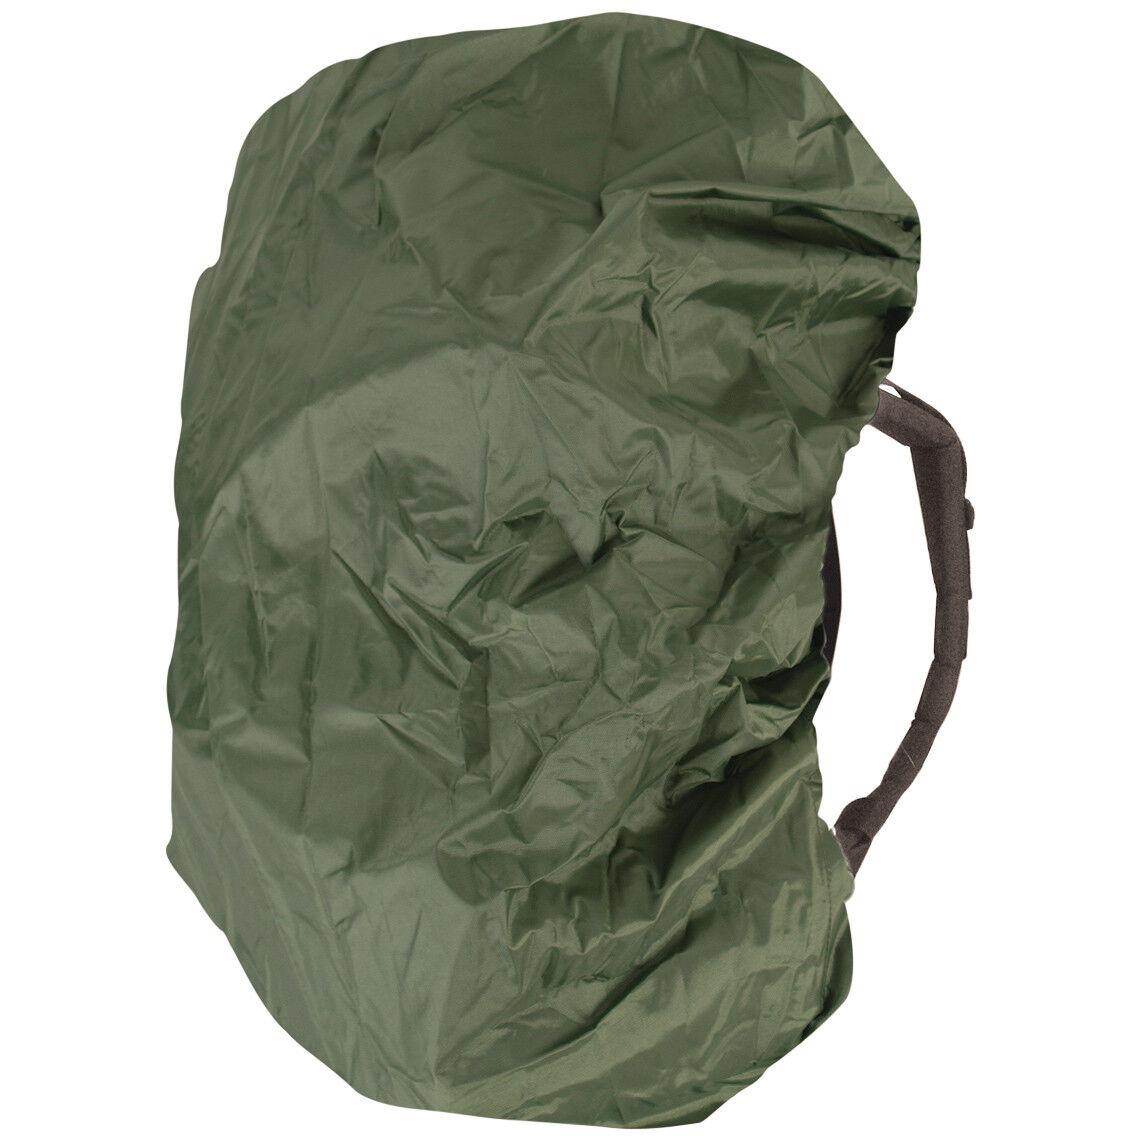 s l1600 - Táctica Senderismo Camping Mochila Mochila Lluvia Tapa Protección Impermeable Ol